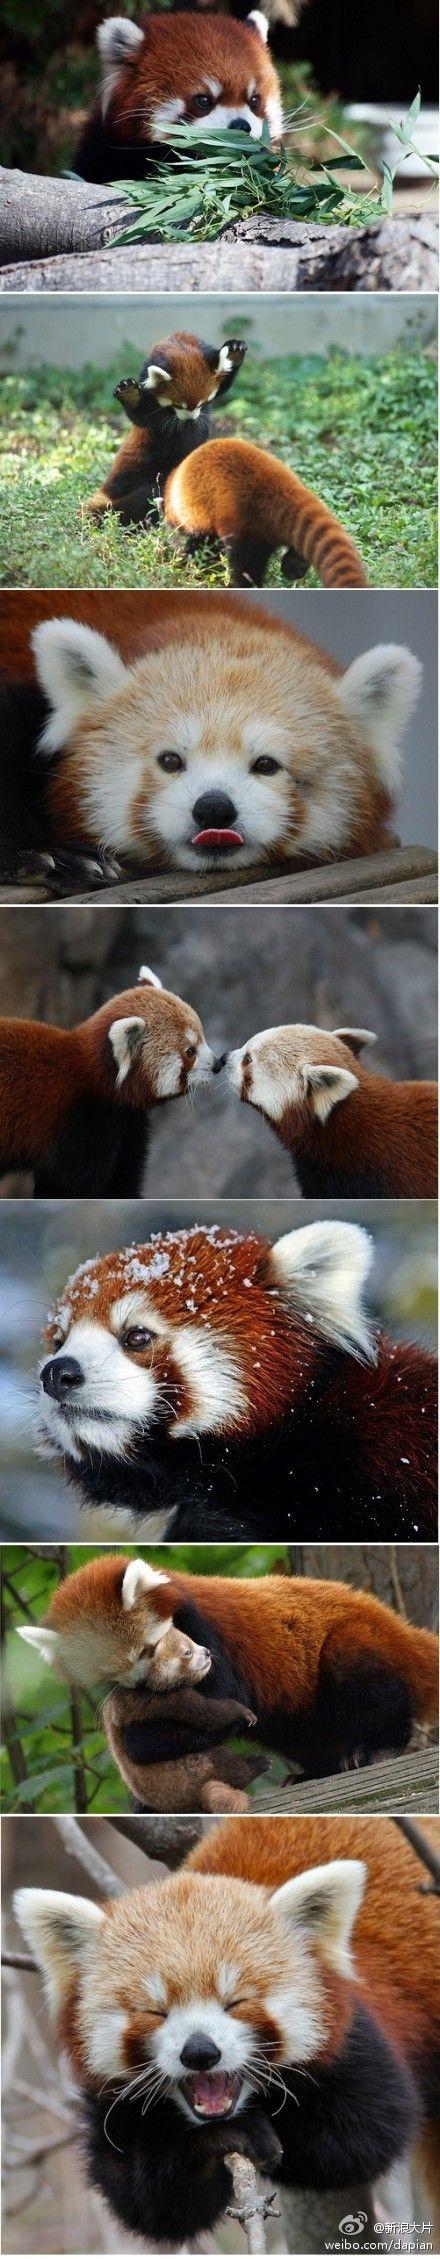 #underrated #redpandas #redpanda #pandas #panda #these #cute #look #guys #red #are #so #atRed pandas are SO under-rated! Look at these guys #babypandas